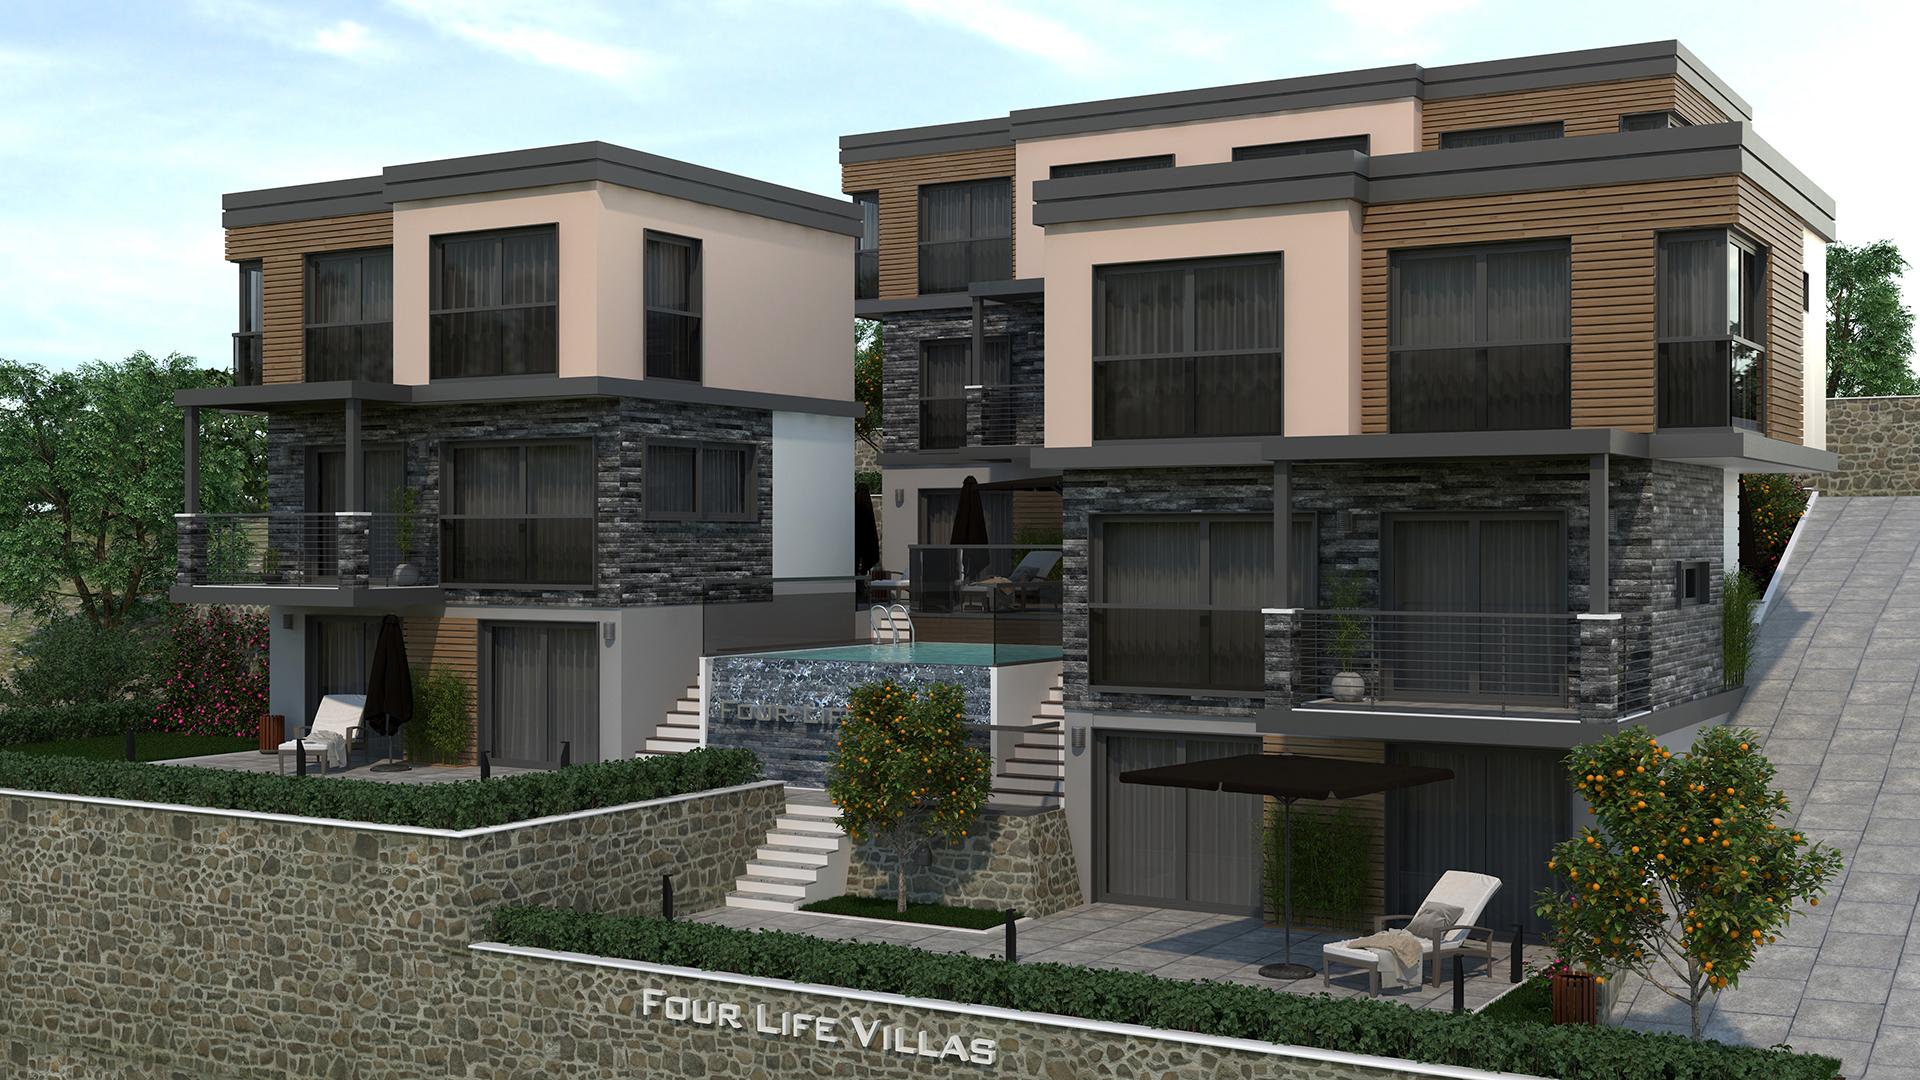 Four Life Villas